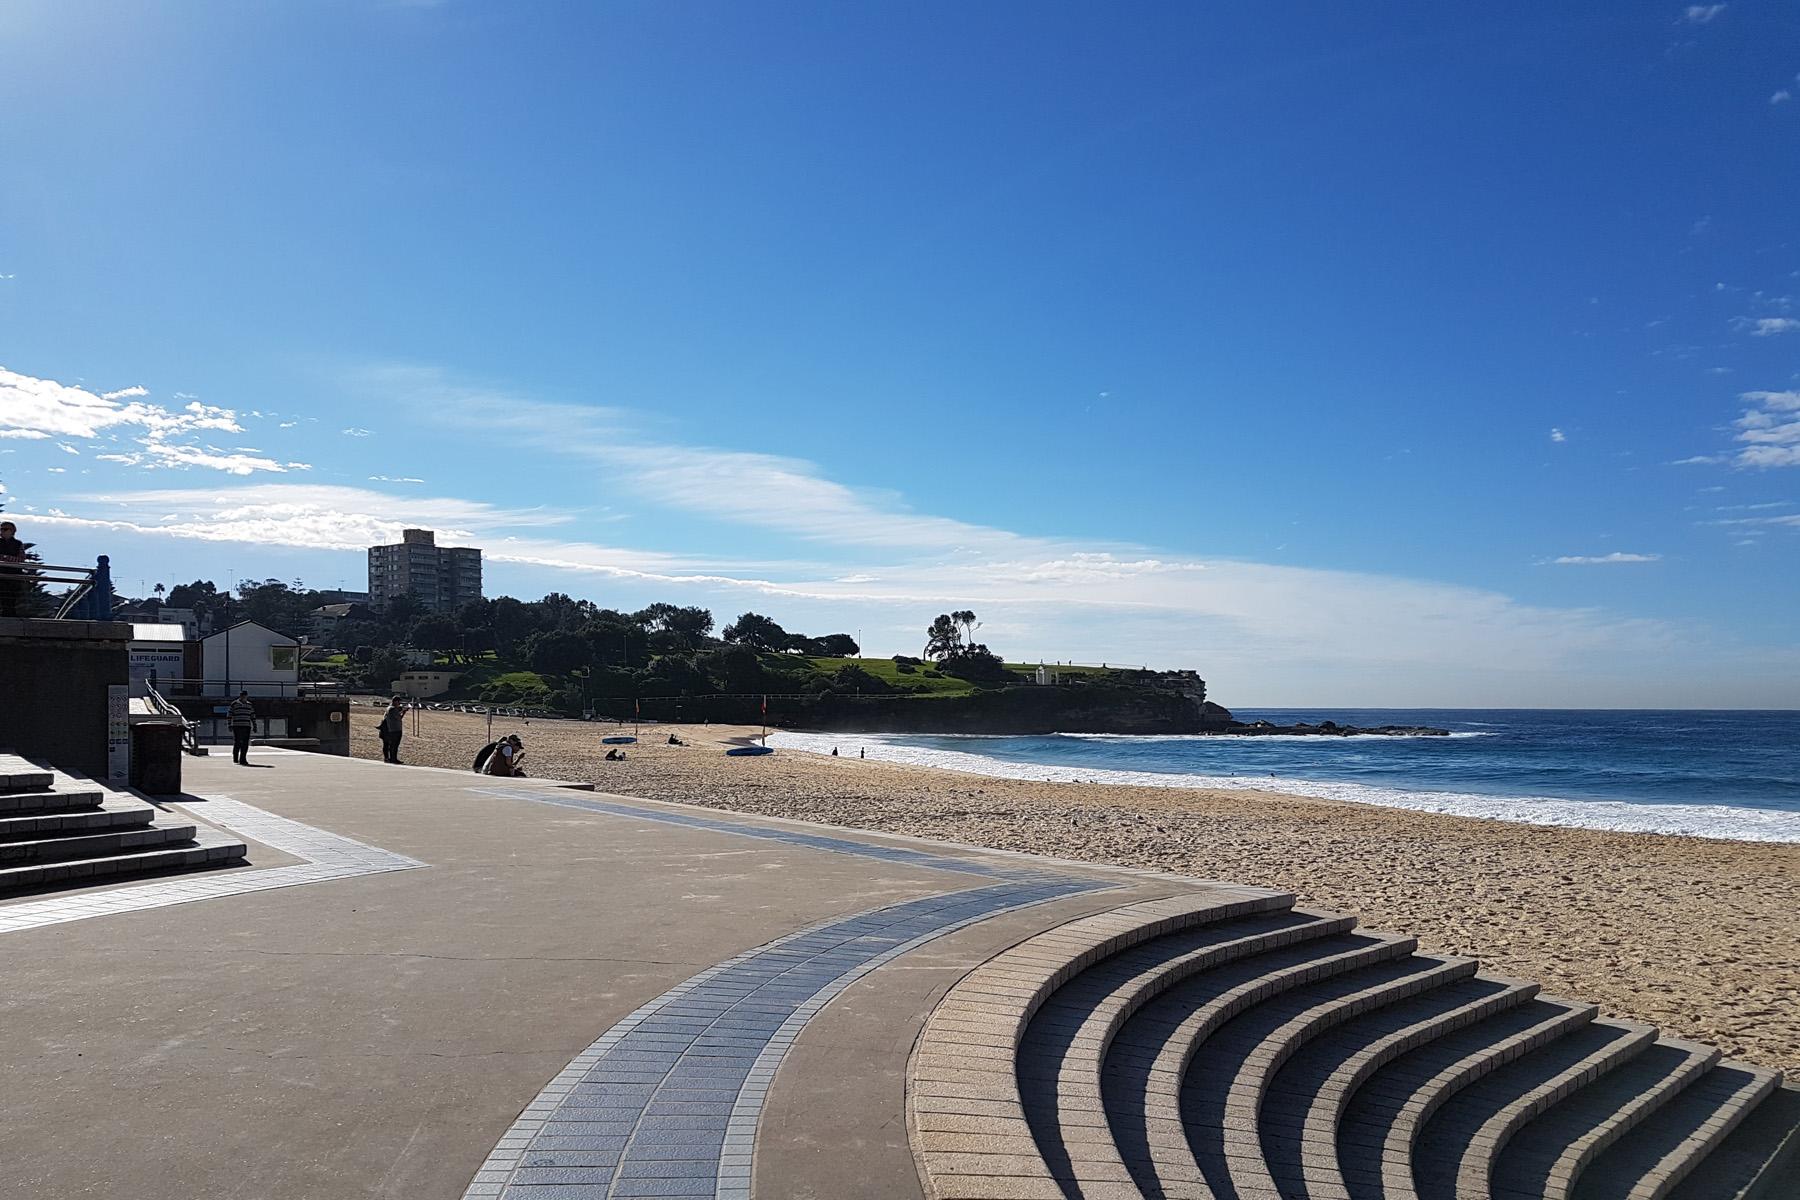 SGMT Australia Sydney_Bondi to Coogee Coastal Walk_01 Coogee Beach